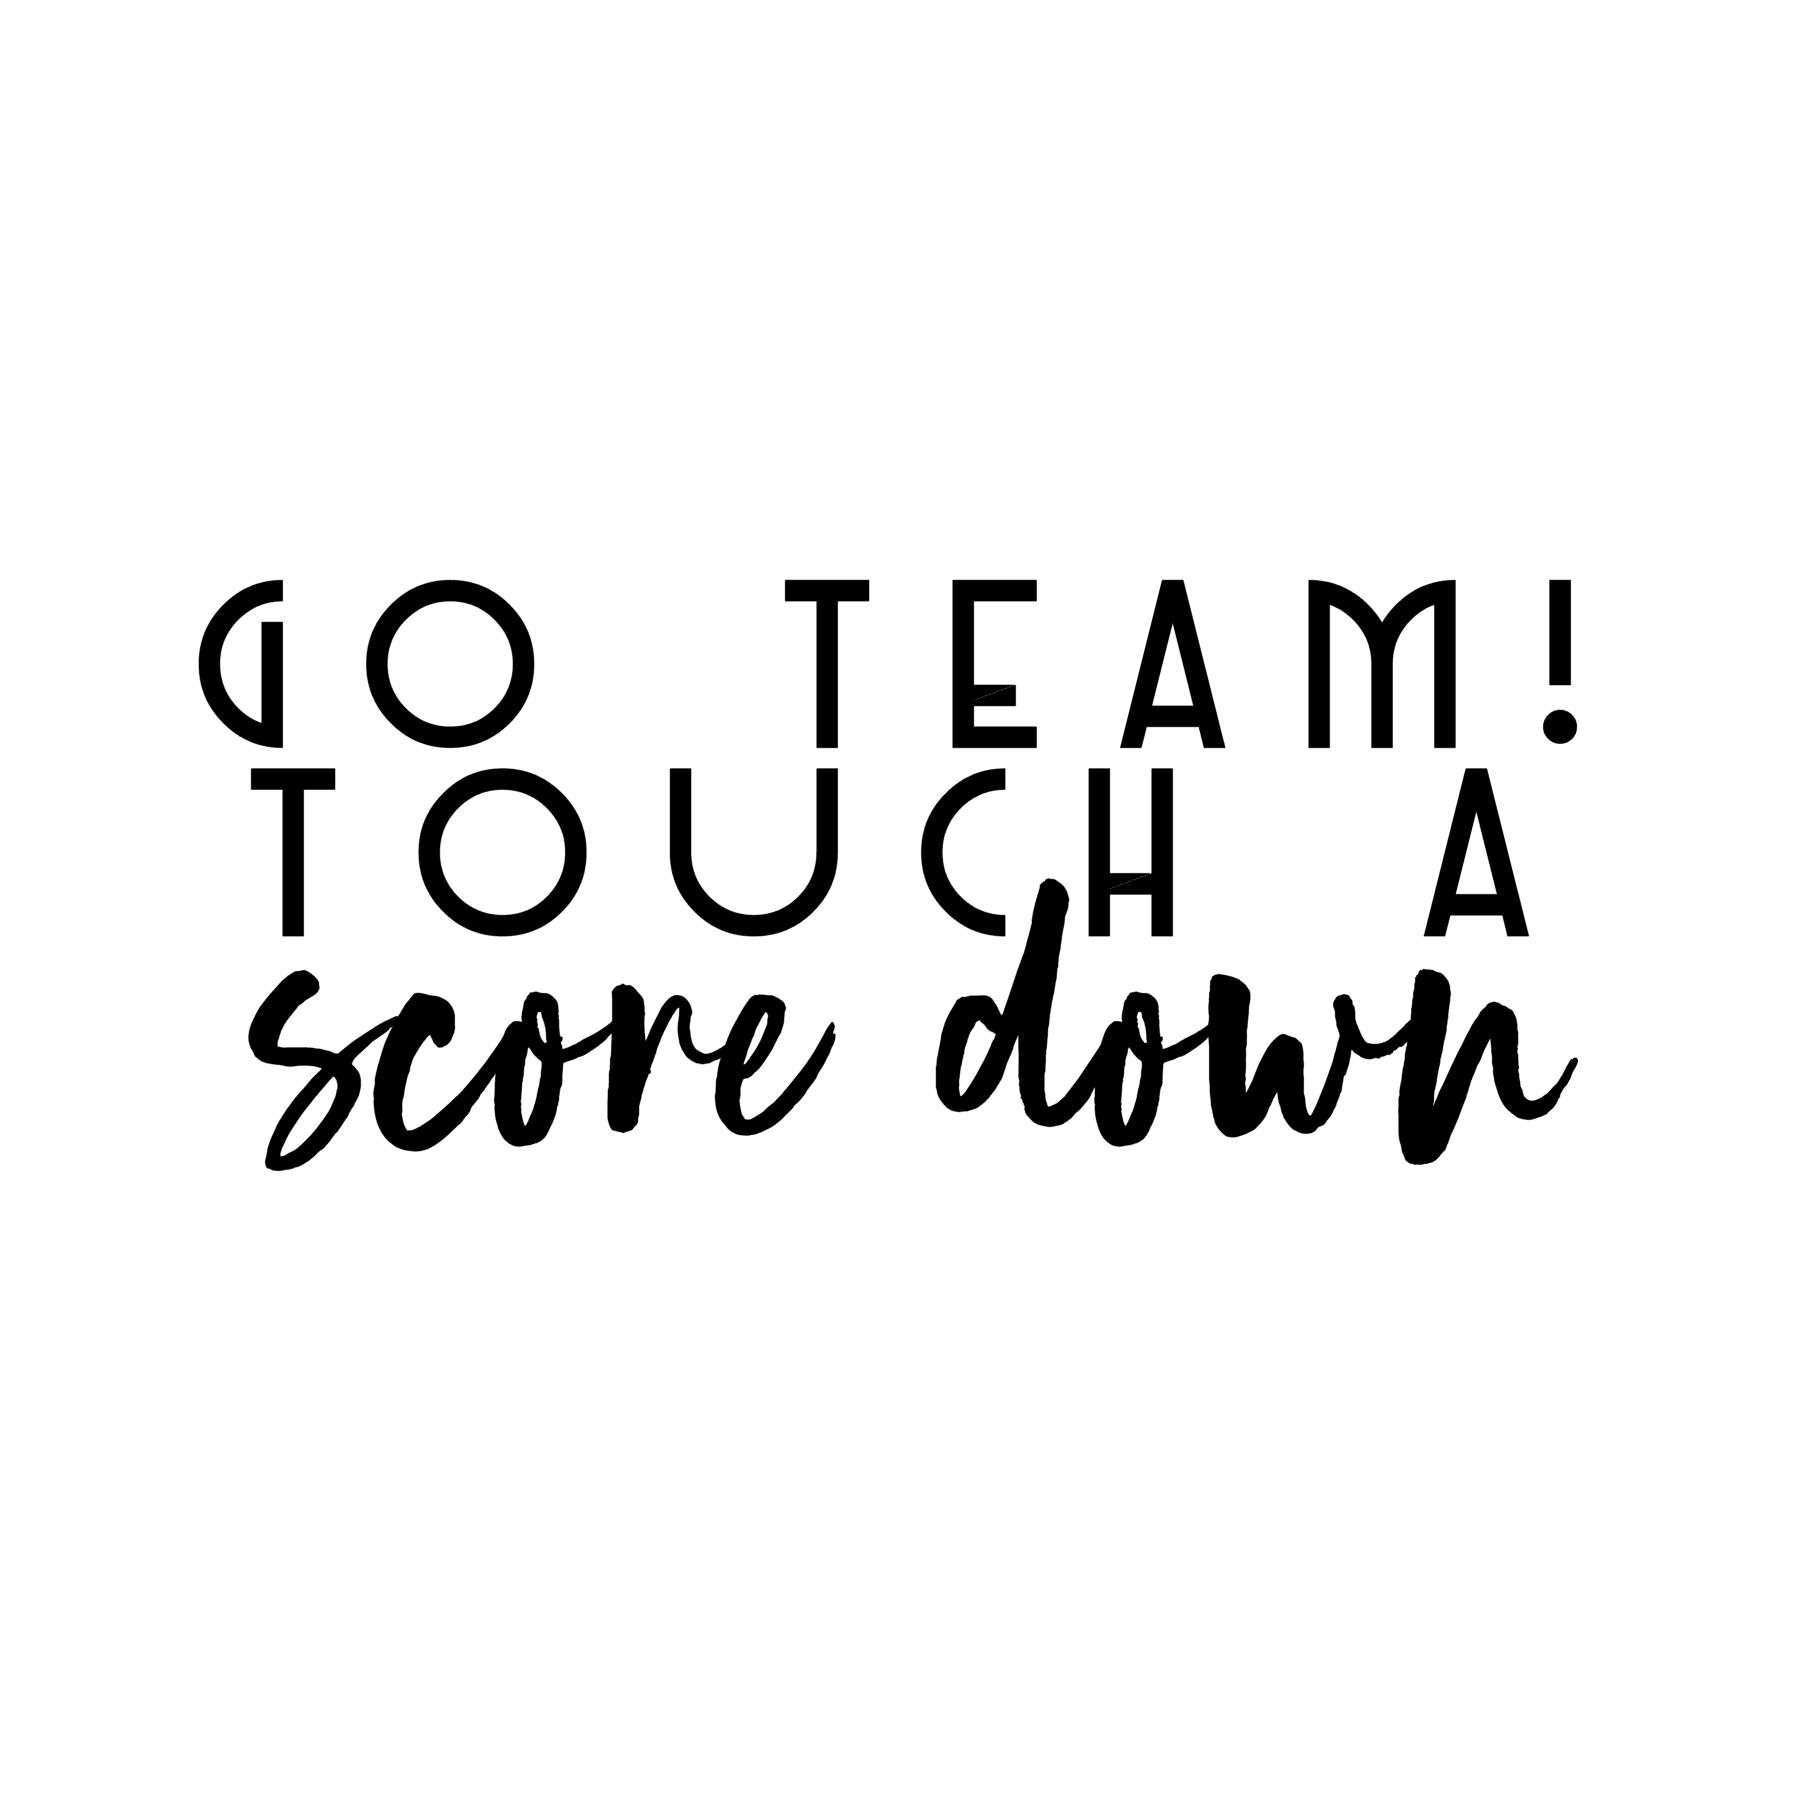 Go Team Touch a Scoredown